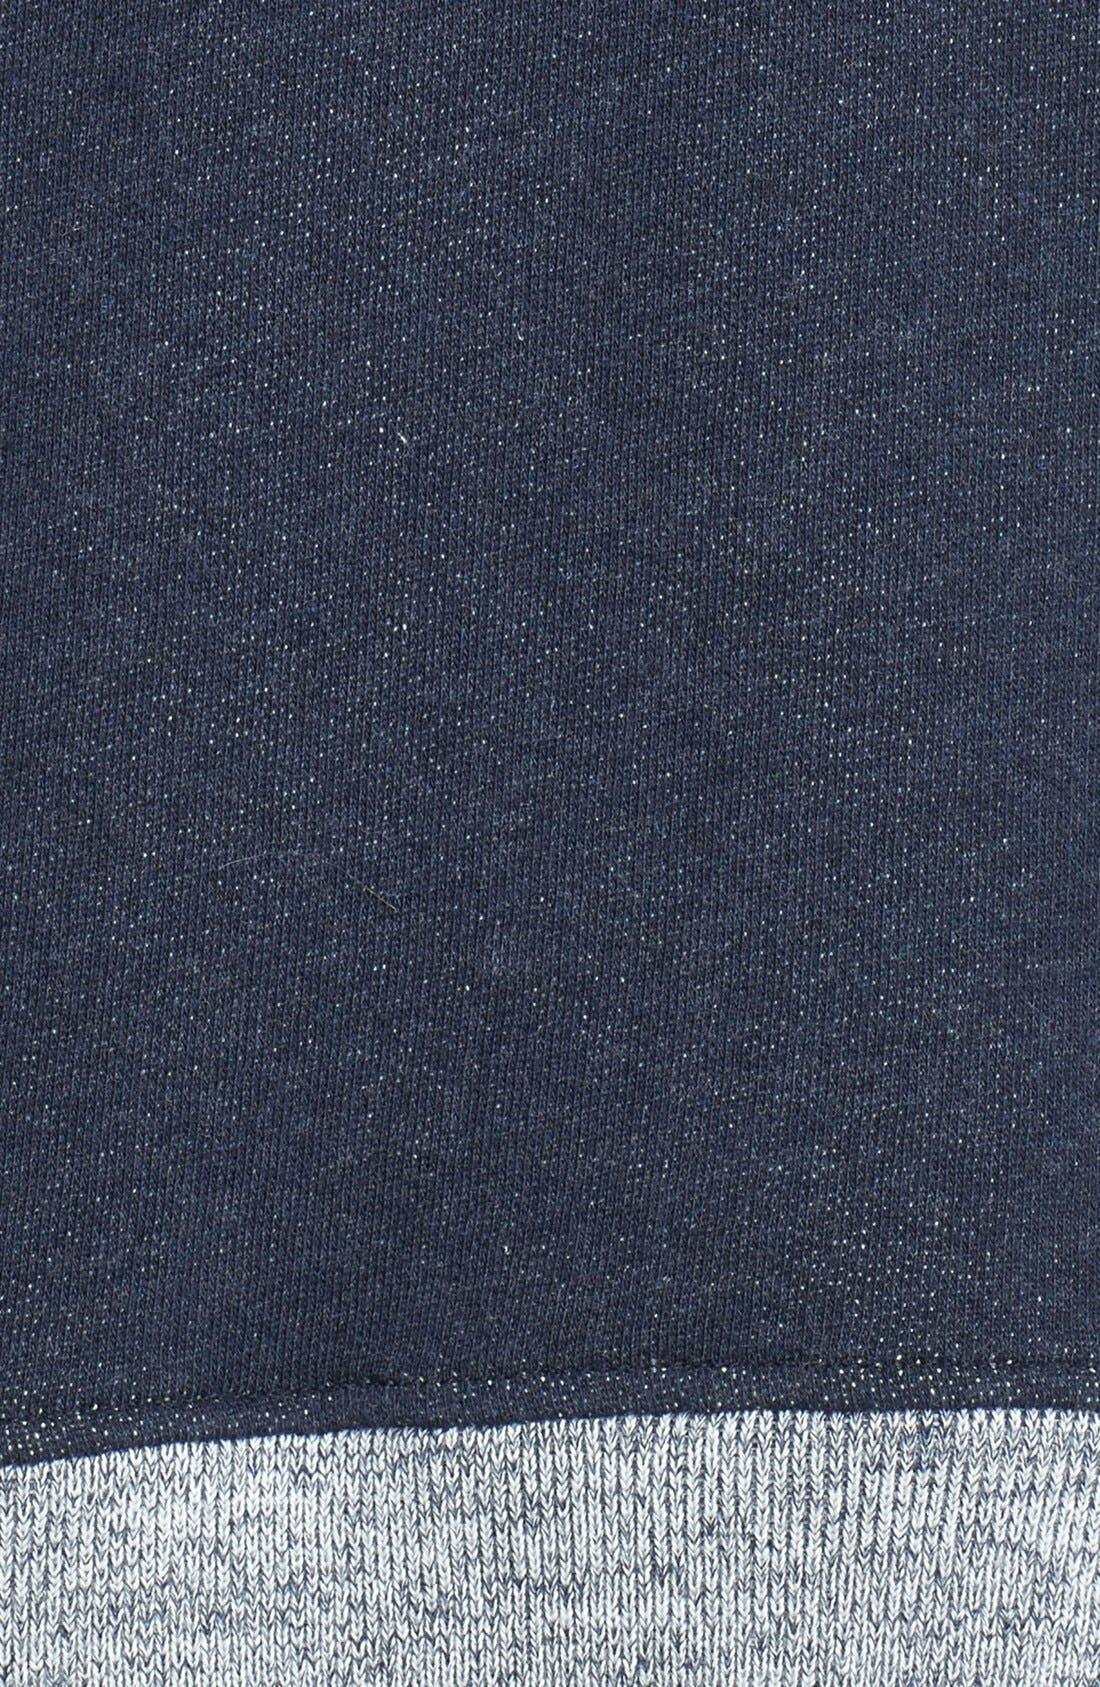 Alternate Image 3  - Theory 'Corbit B' Side Zip Cotton Sweatshirt